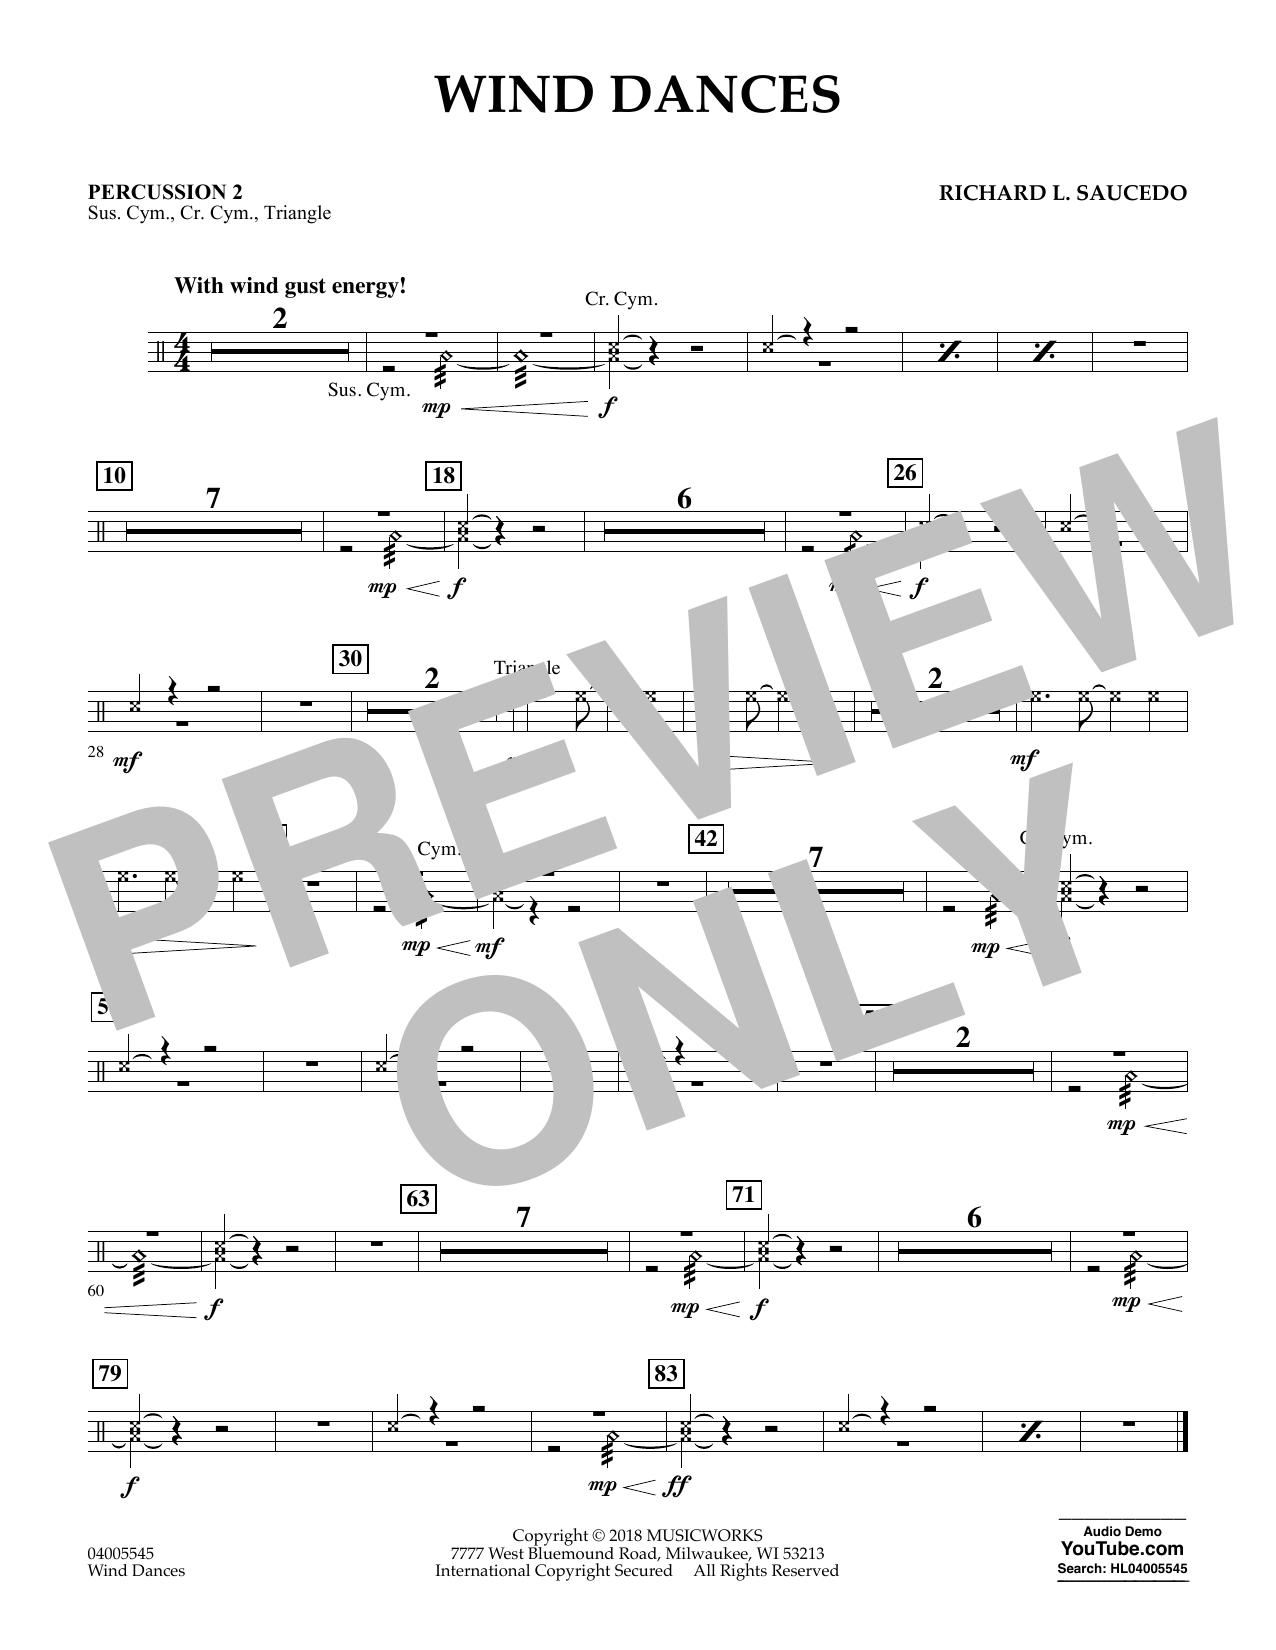 Wind Dances - Percussion 2 (Concert Band)